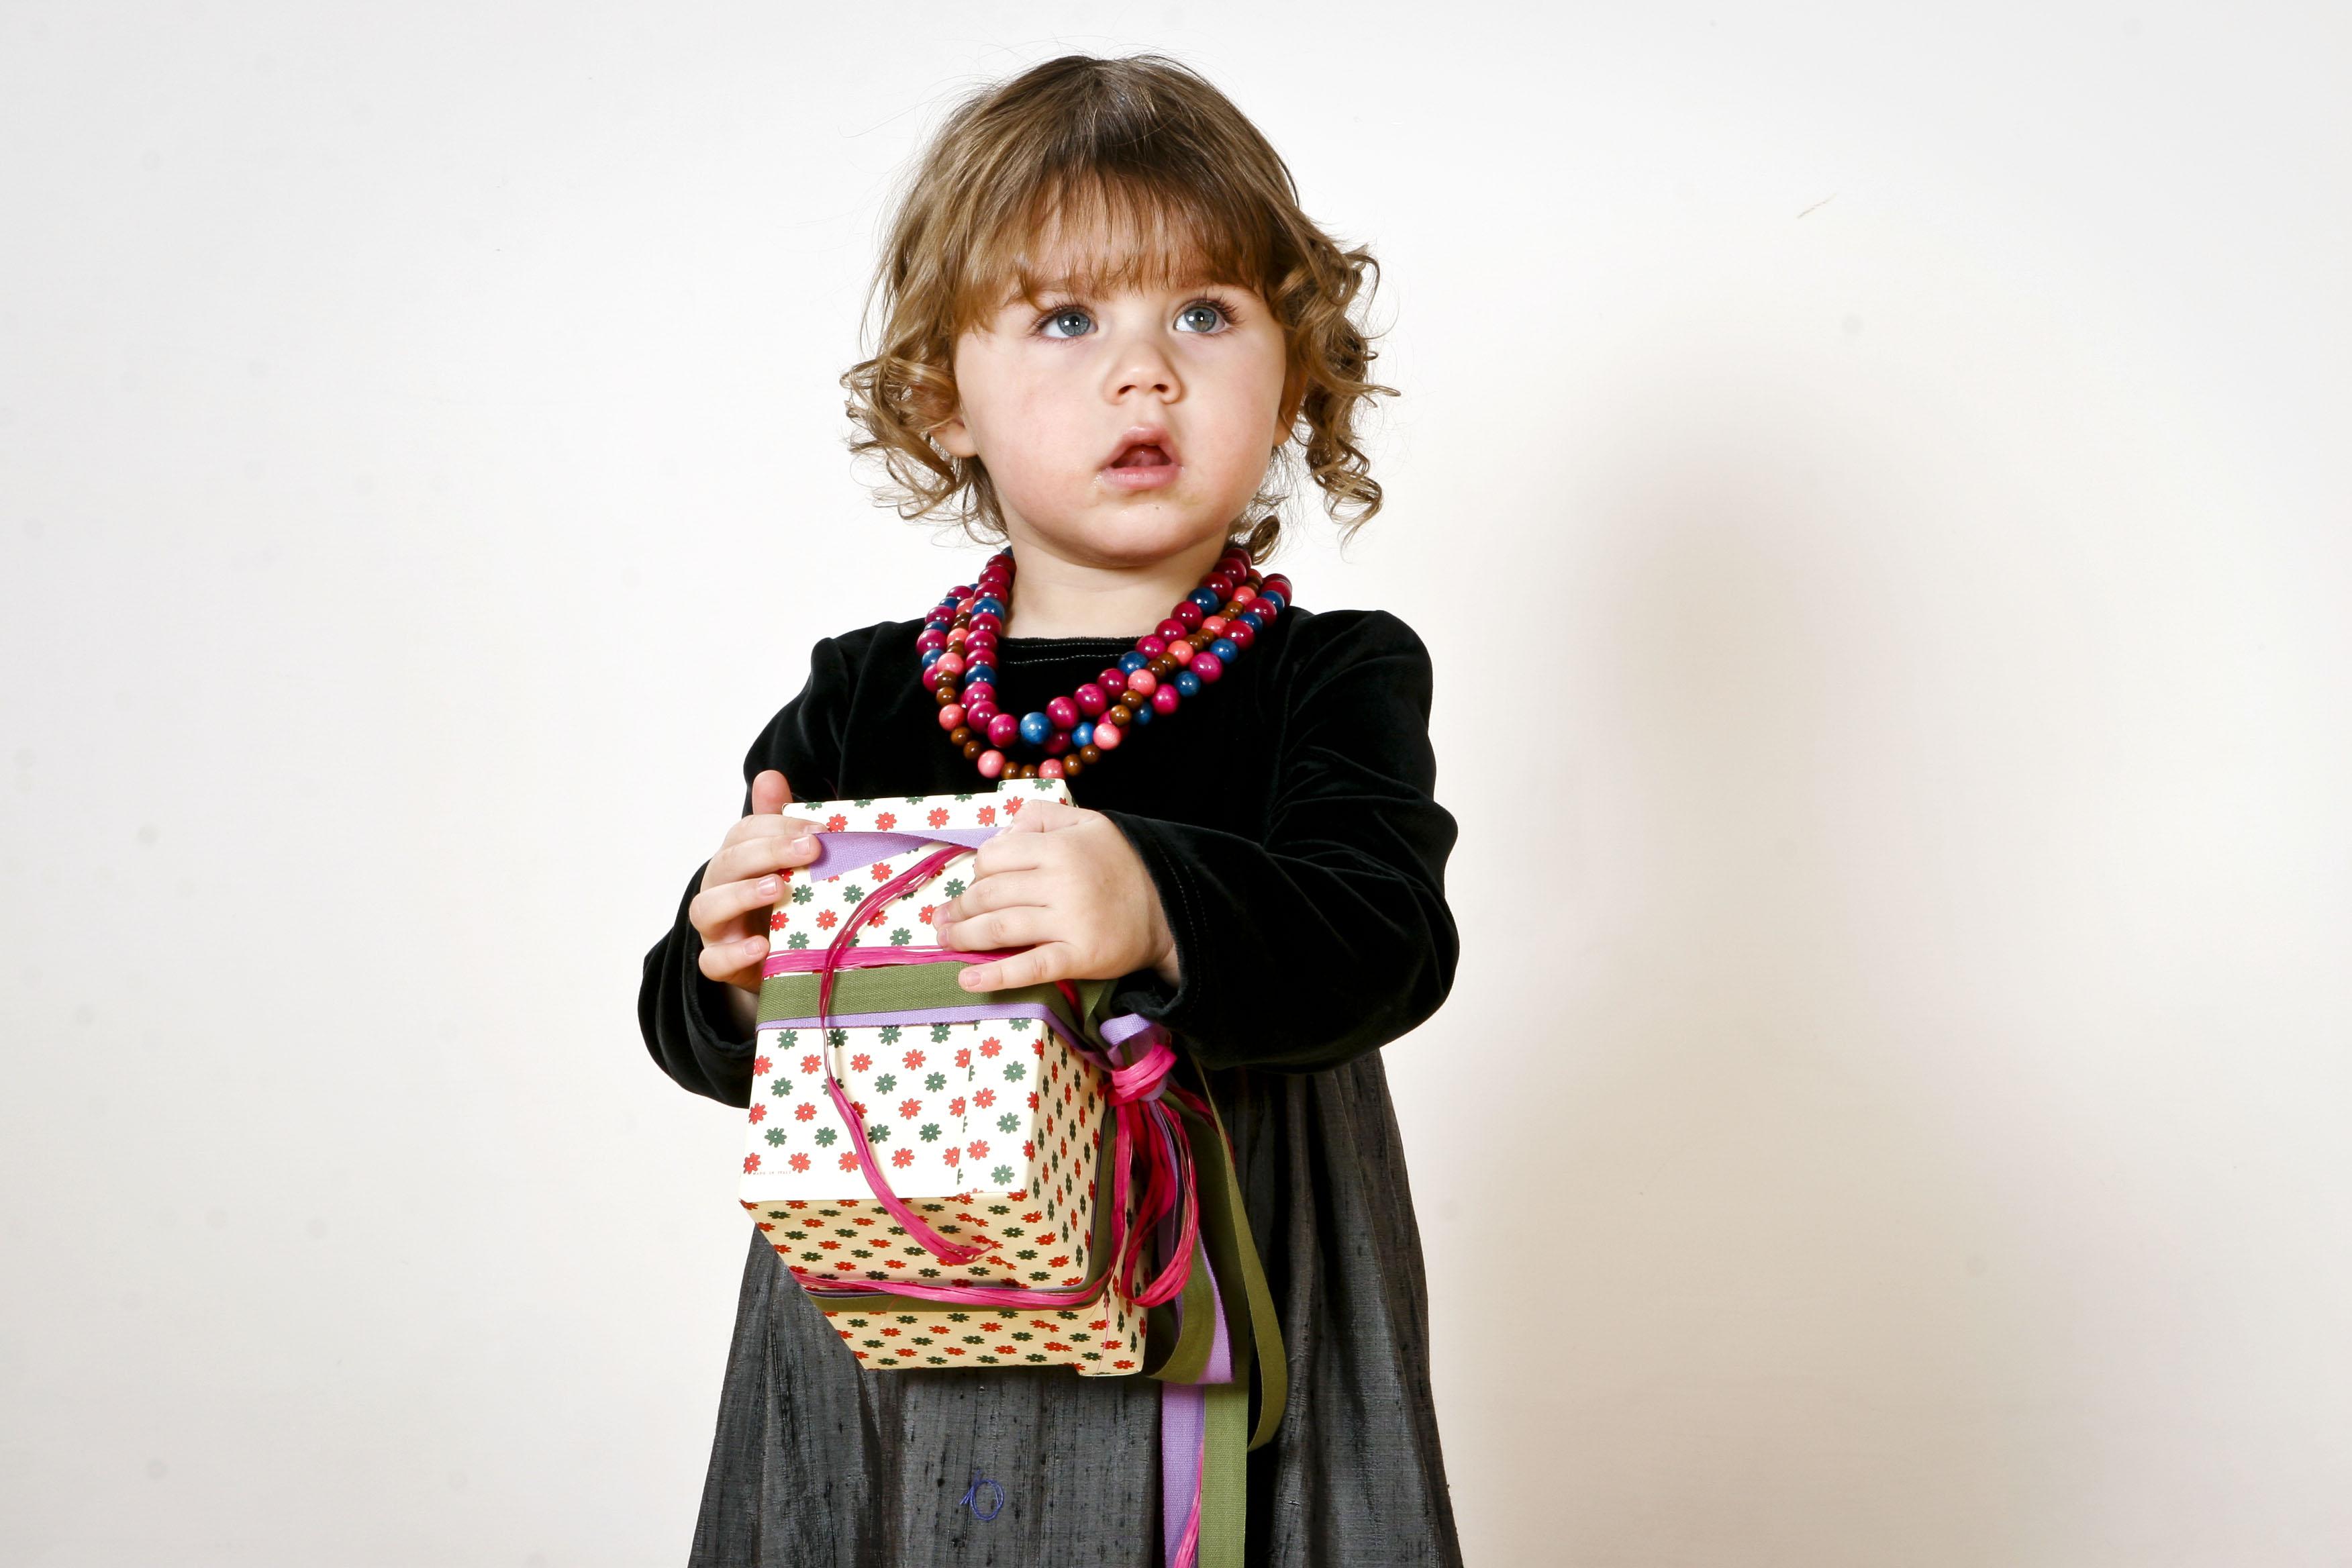 Ang un bebè _ Lucia Giacani